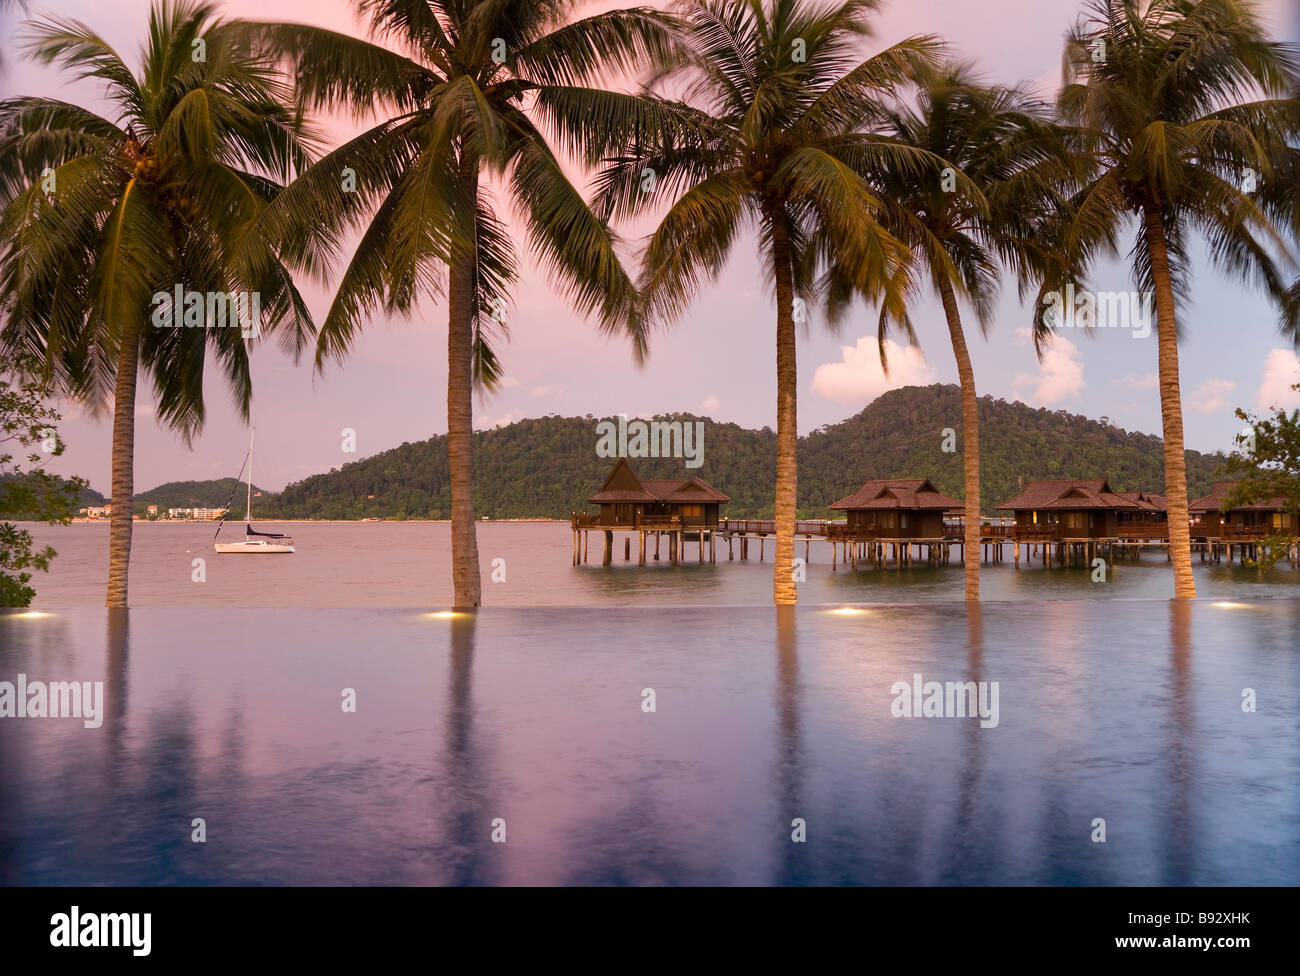 Sea houses through palm trees - Stock Image